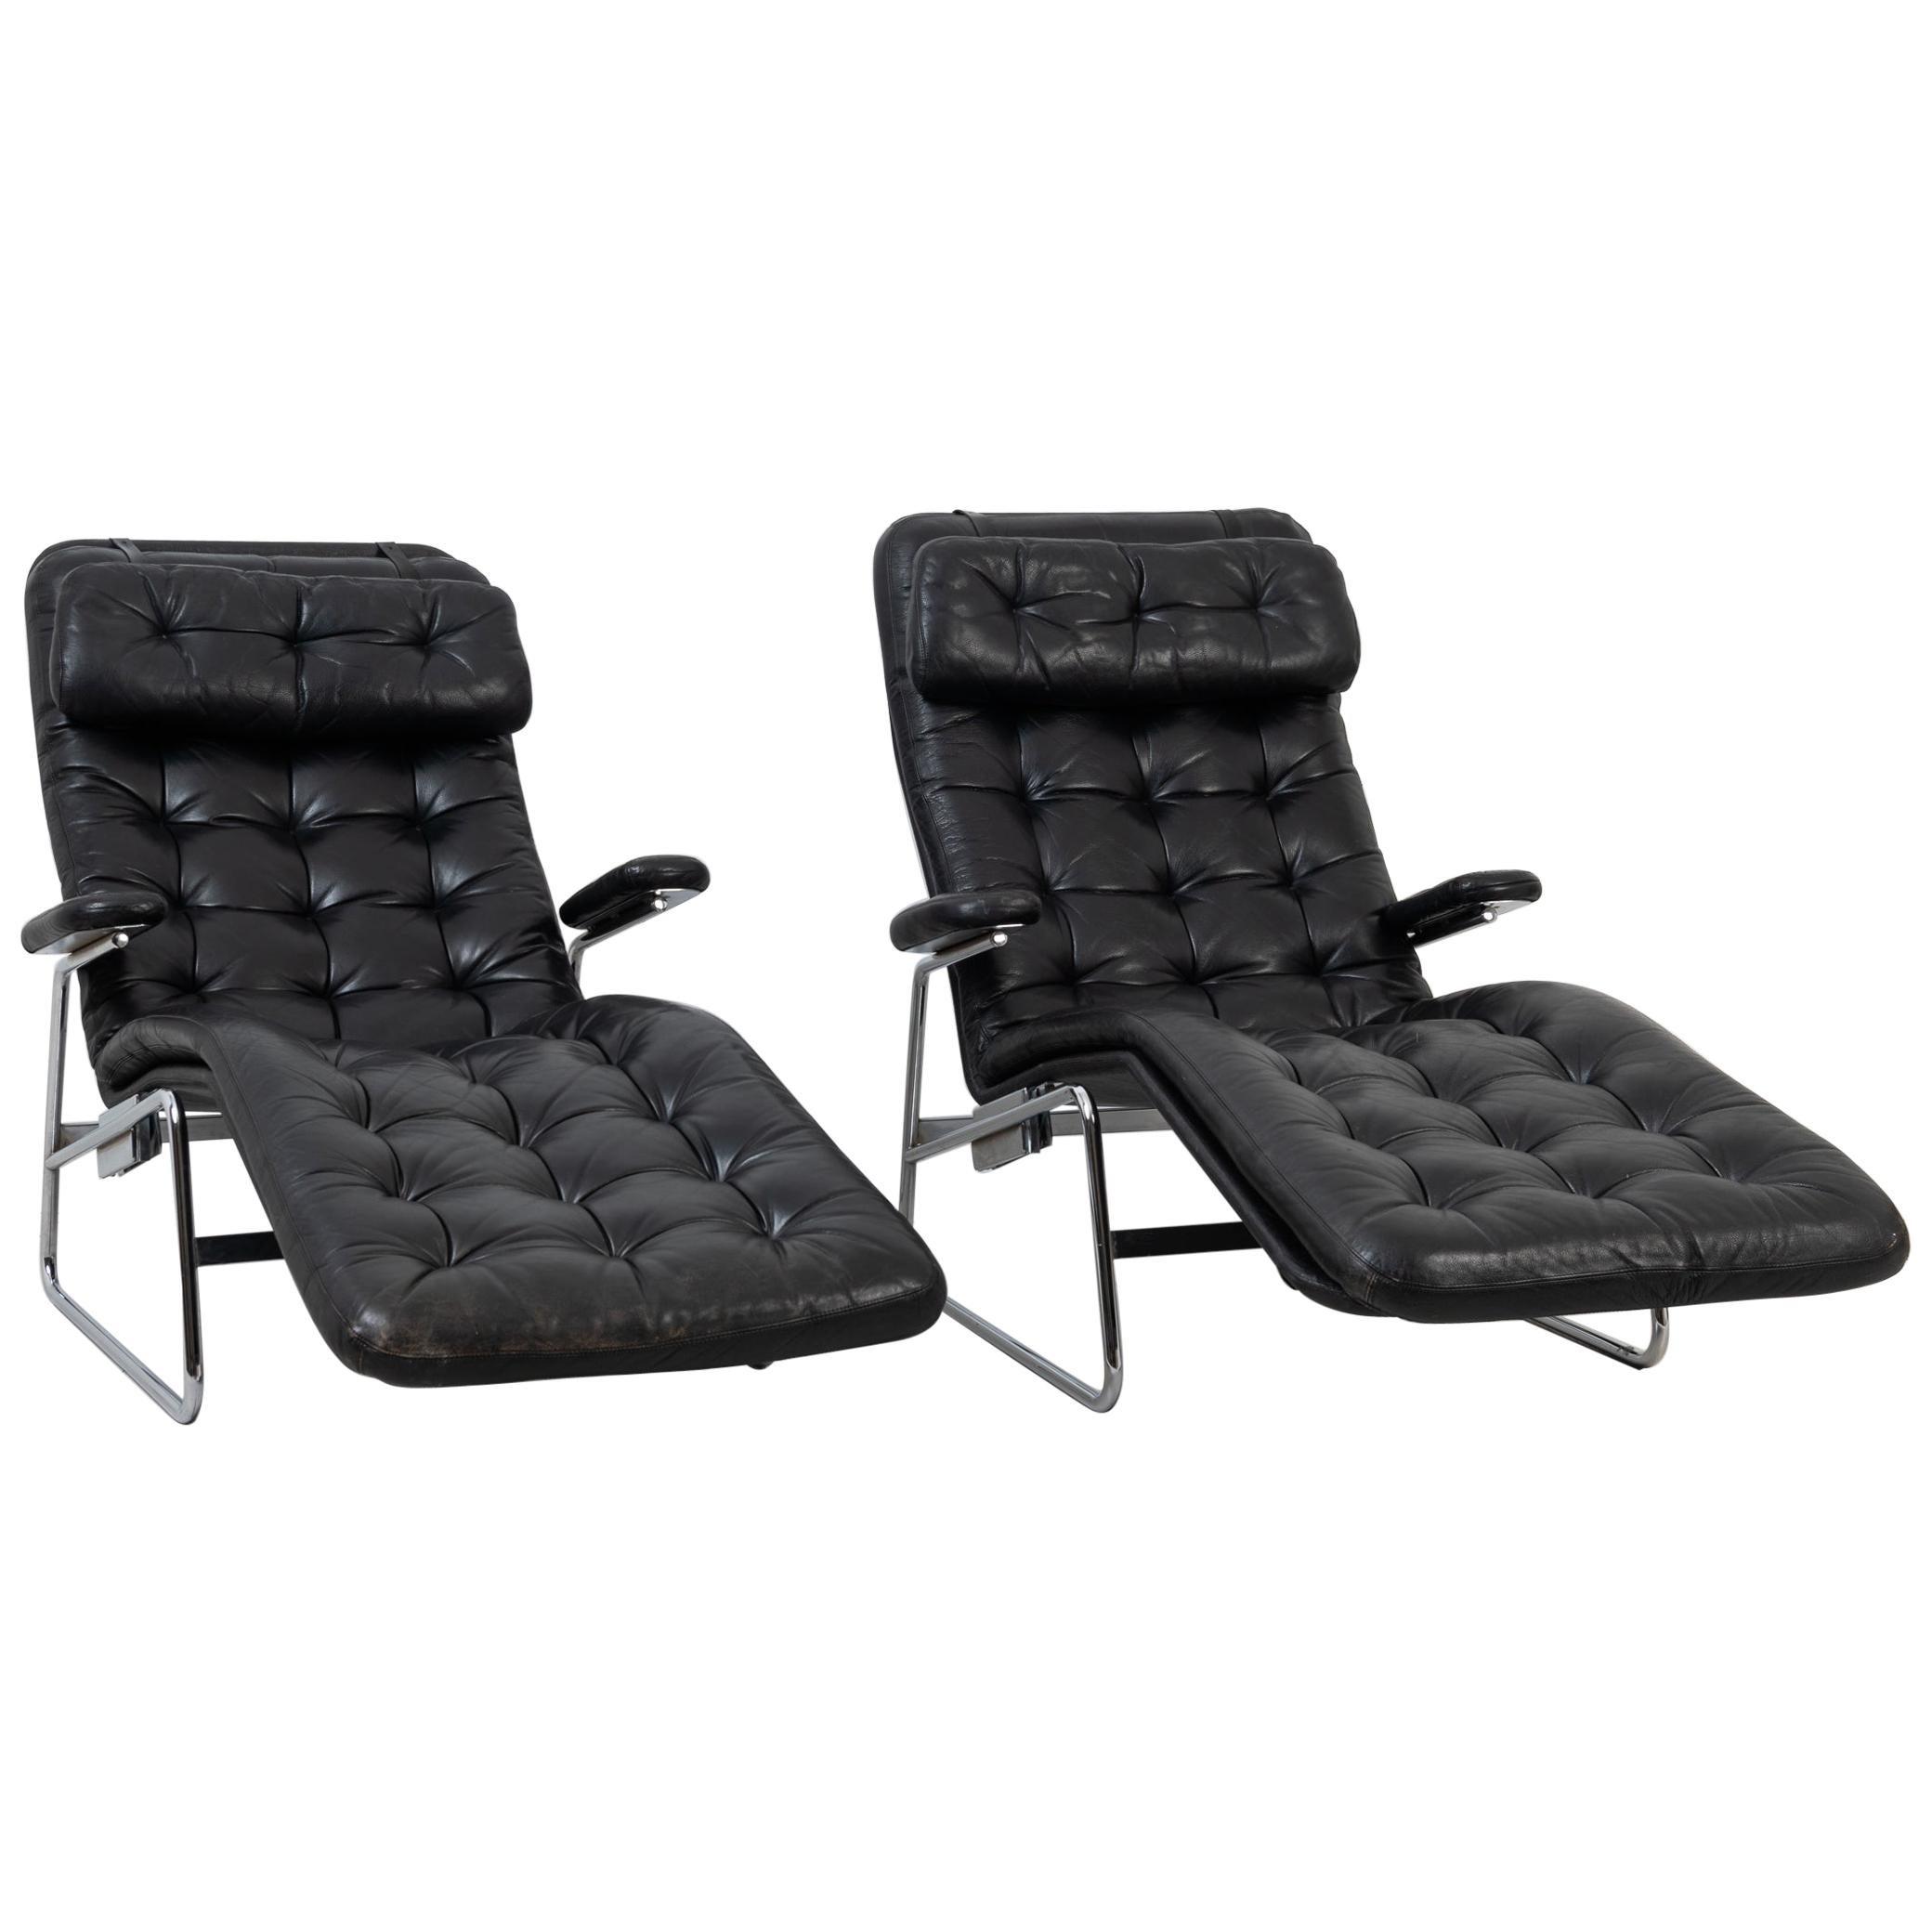 Scandinavian Modern Fenix Lounge Chairs for DUX